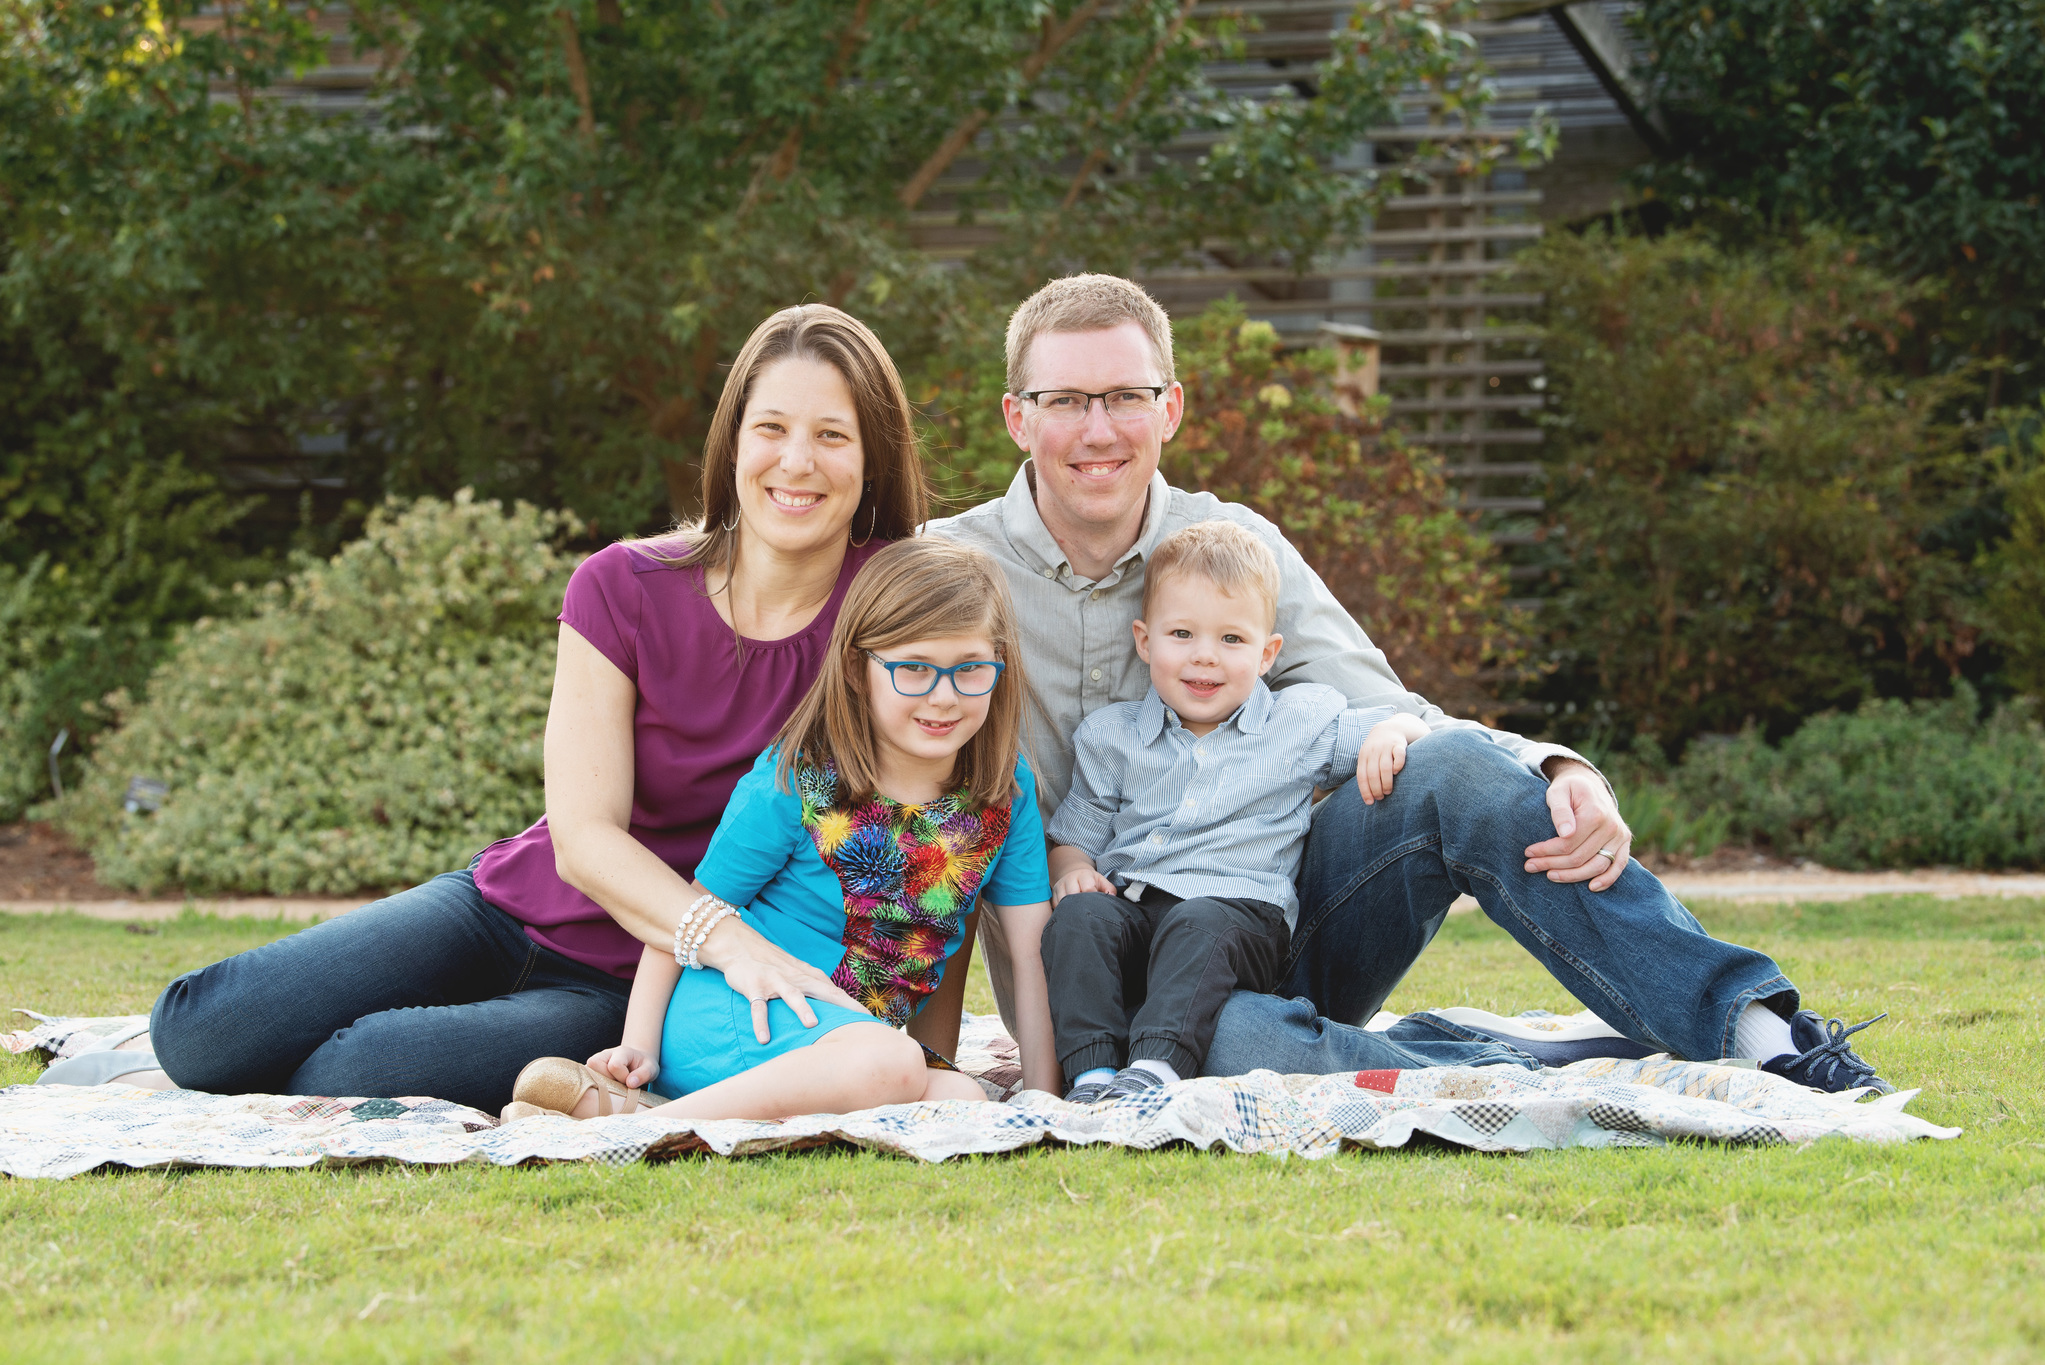 MacIntyre Family on Blanket